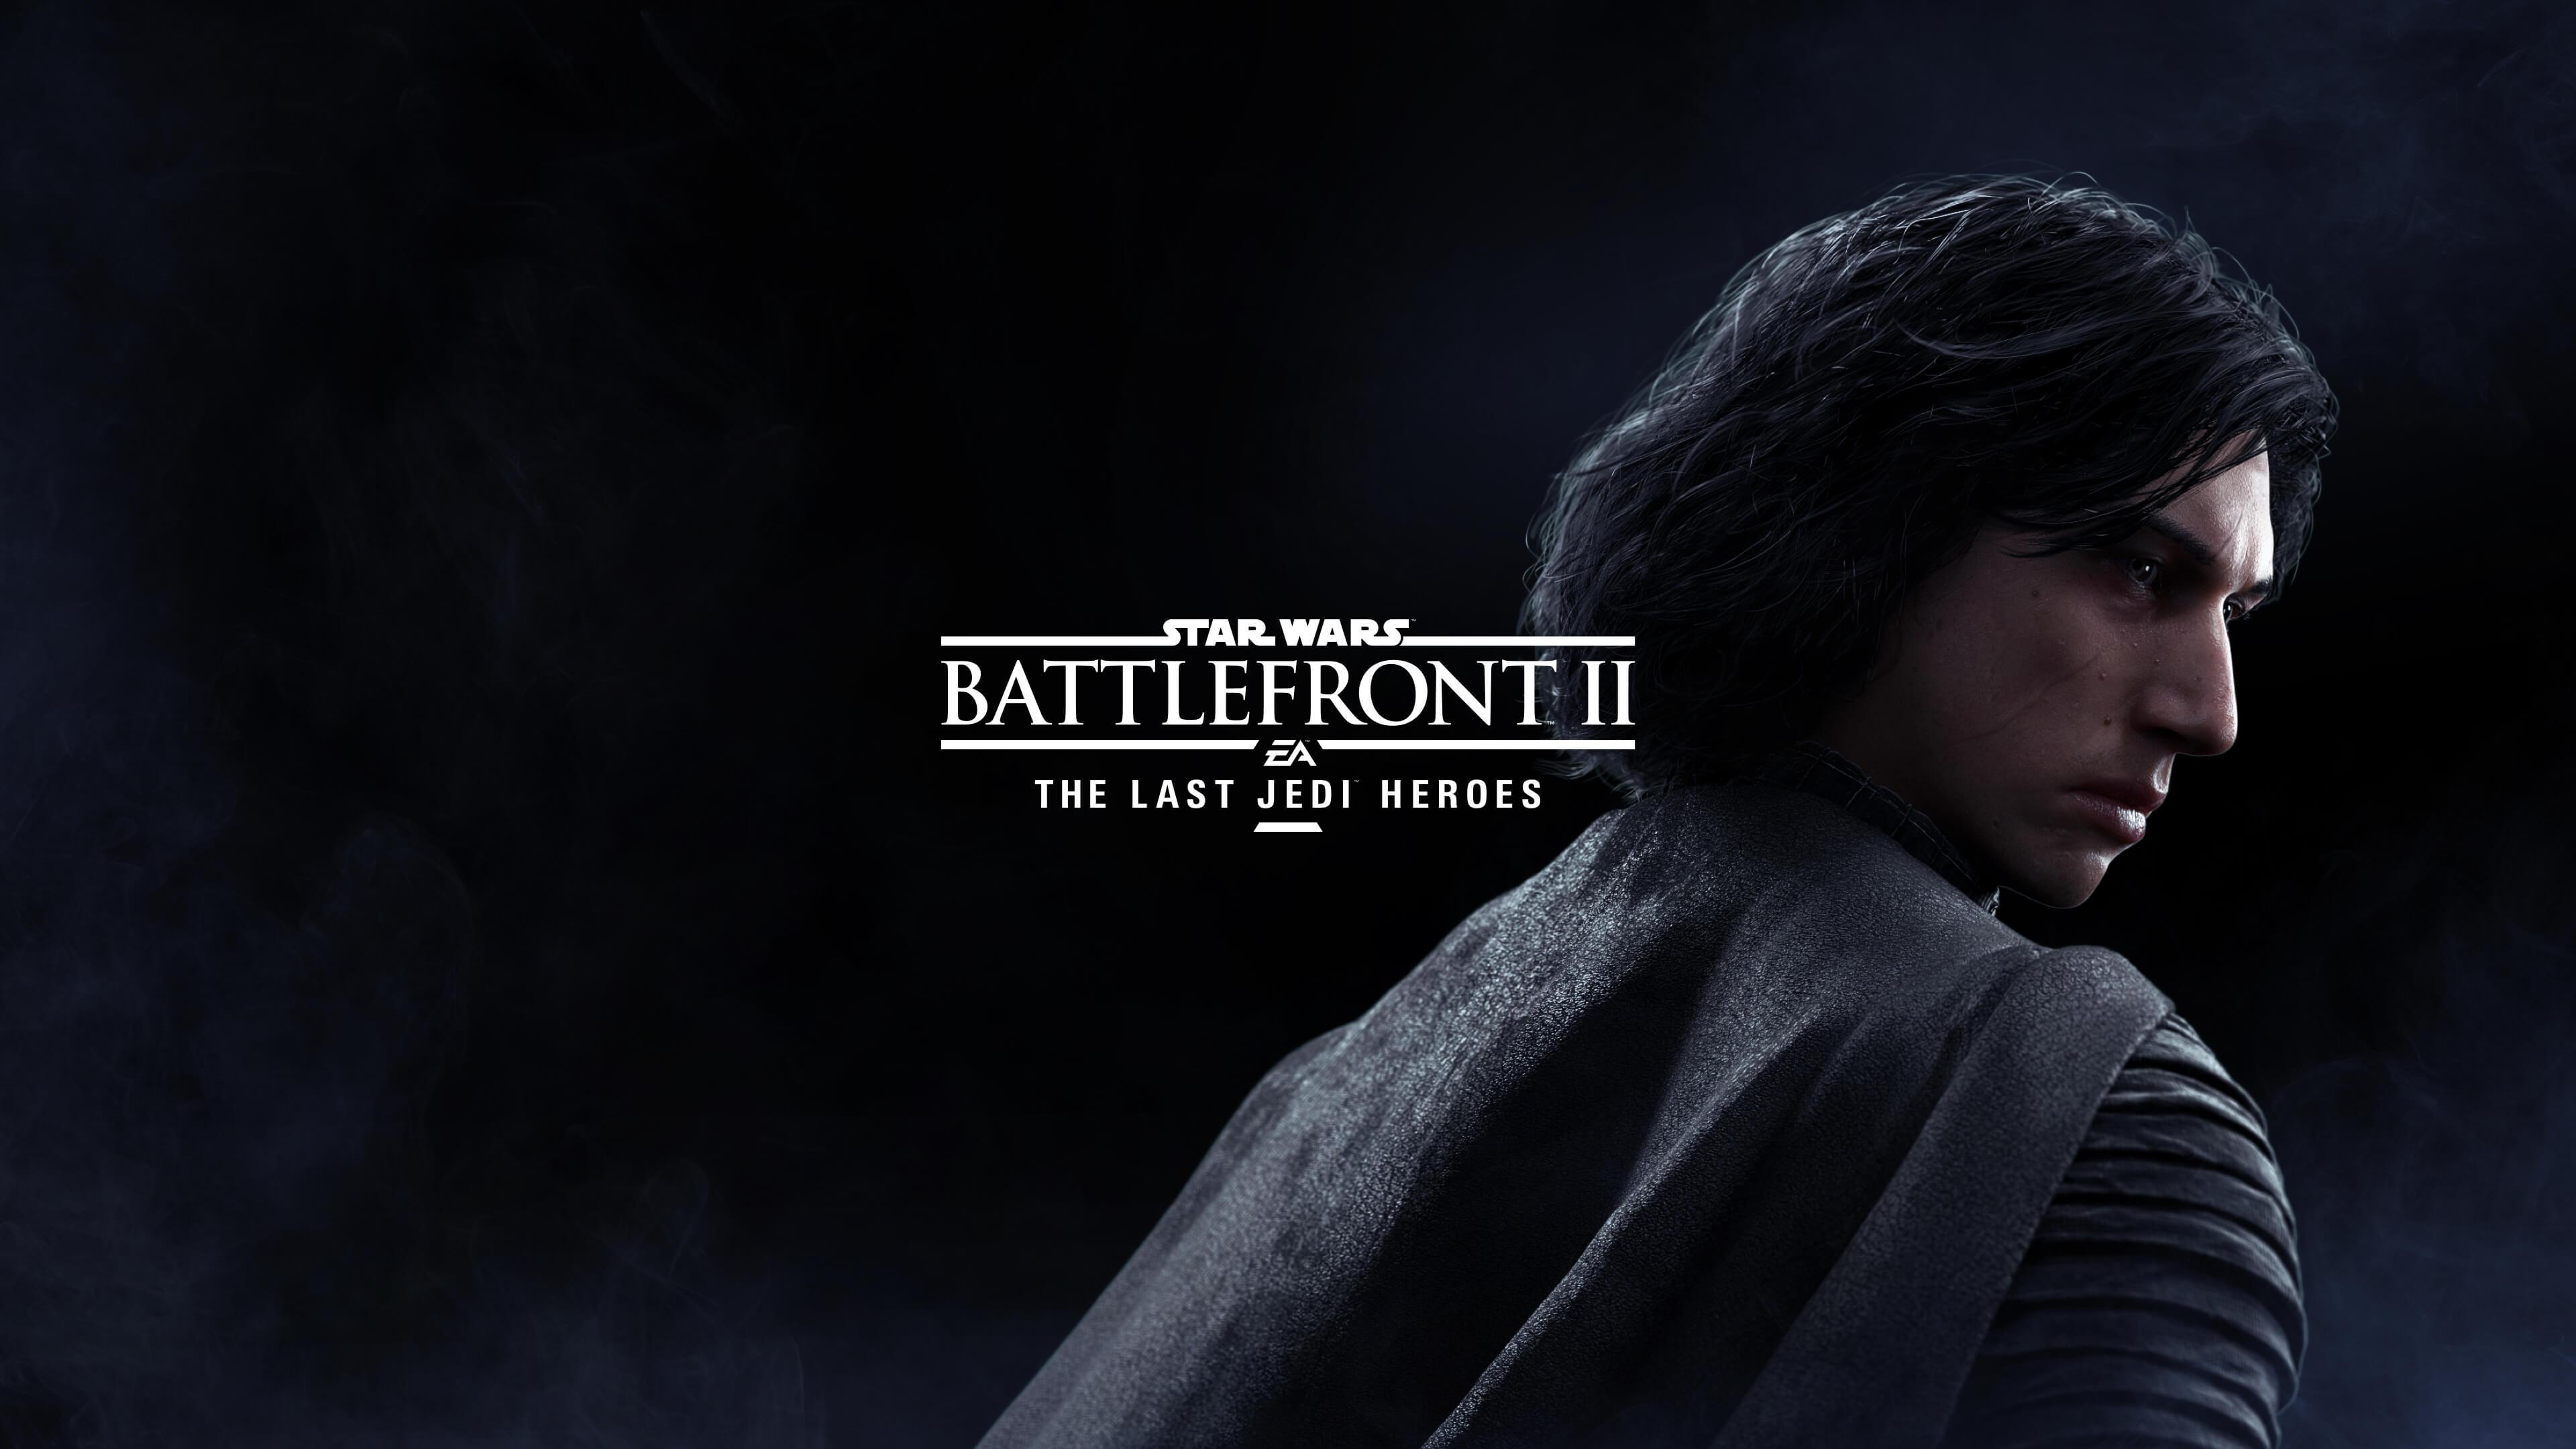 Кайло Рен - Star Wars: Battlefront 2 (2017) Арт